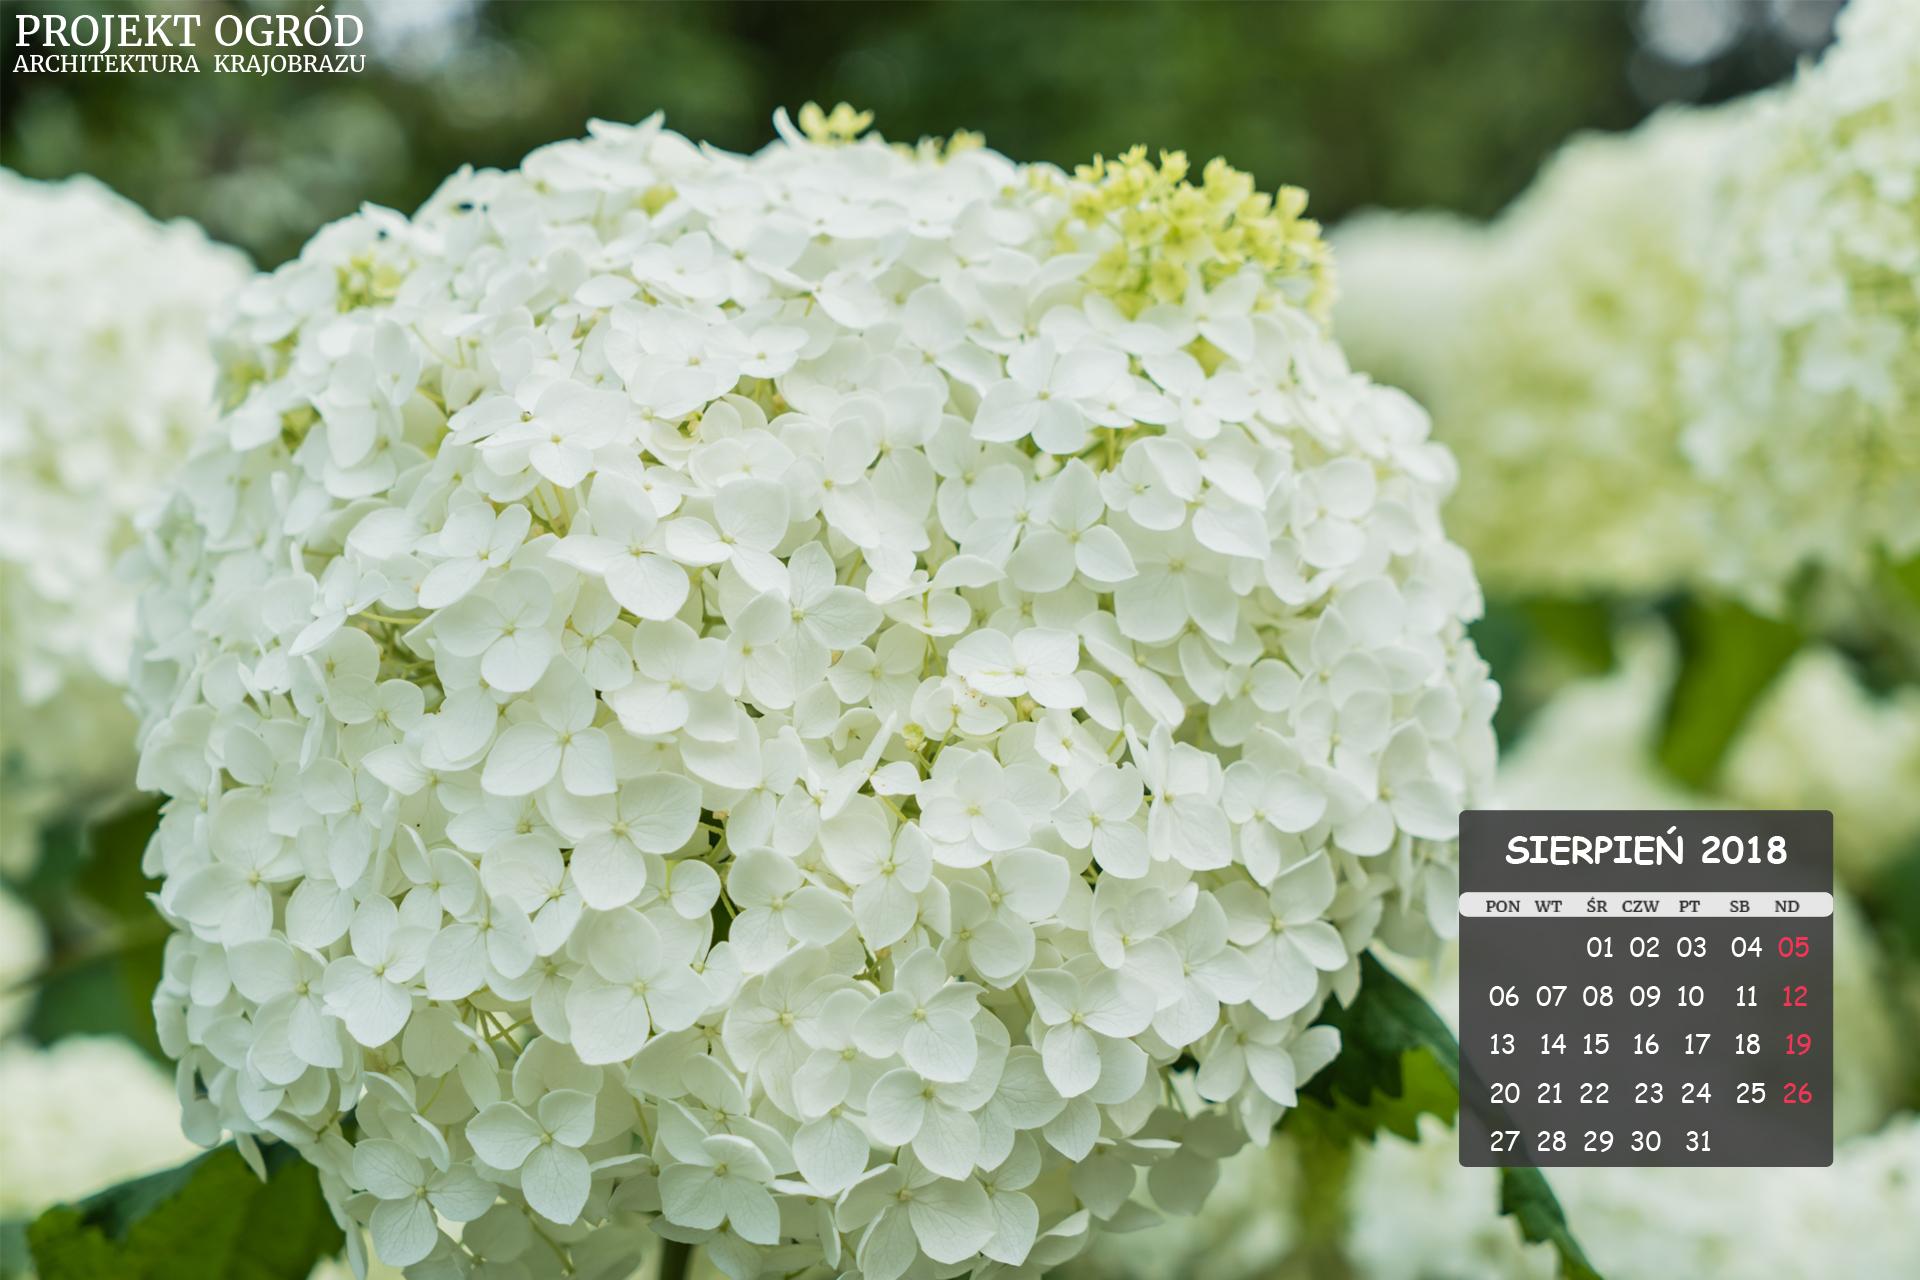 kalendarz-b-sierpien-1920x1280